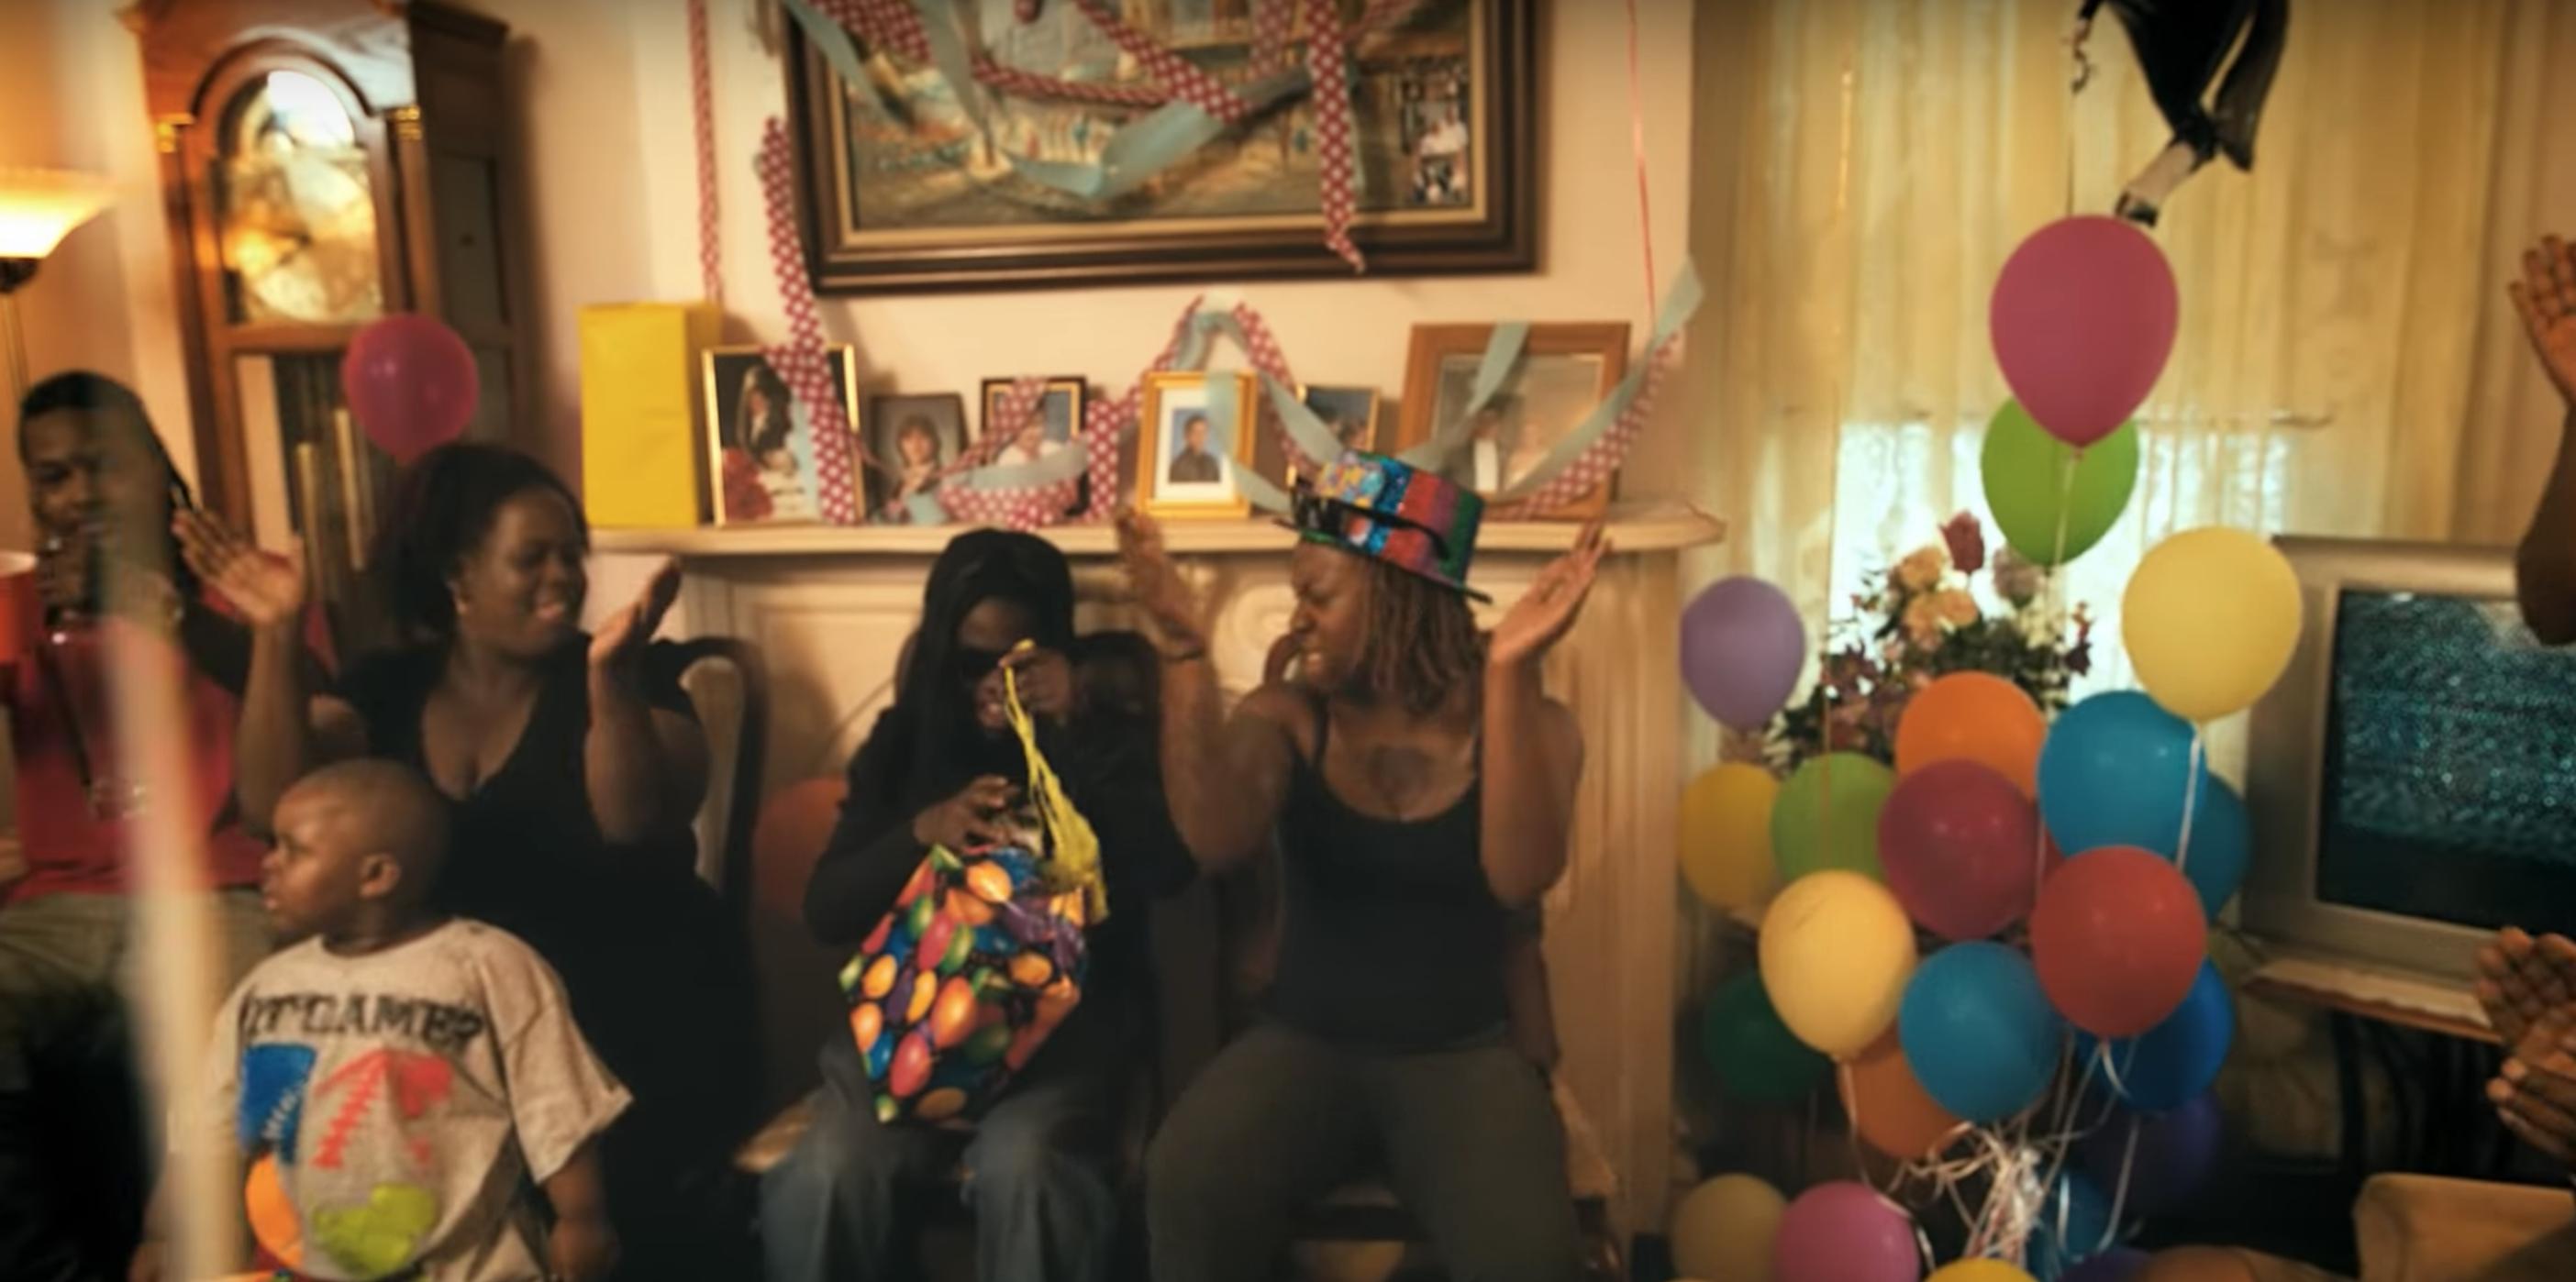 2 Chainz Birthday Video Birthday Gif Color Themes Accessory Inspiration